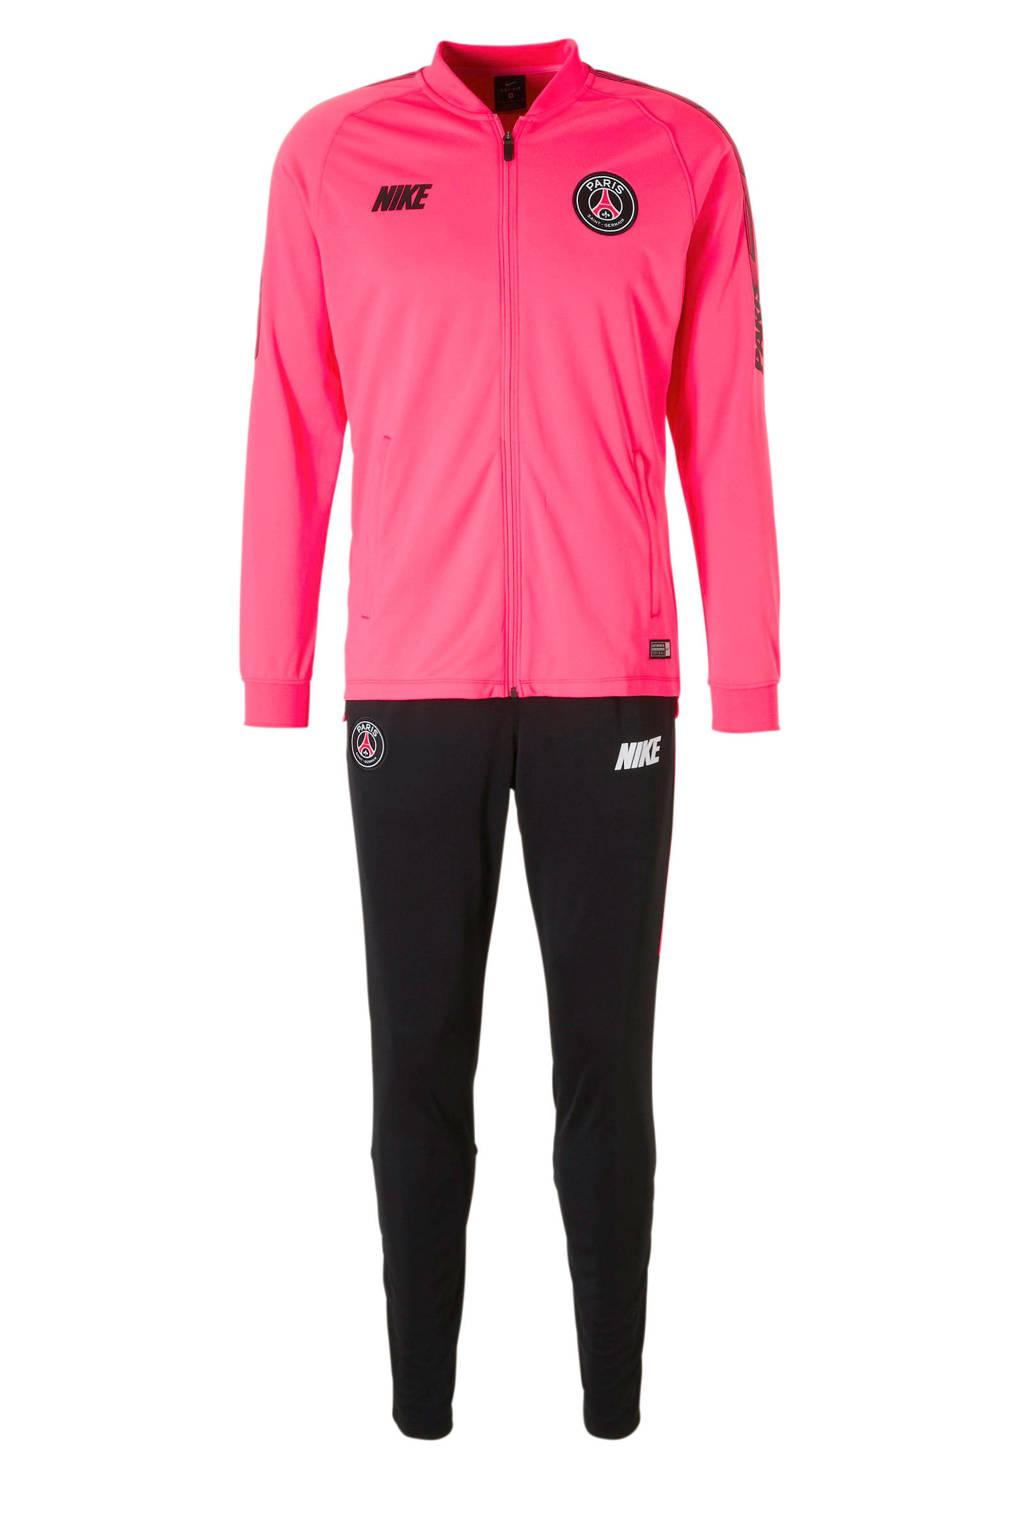 Nike   trainingspak roze/zwart, Roze/zwart